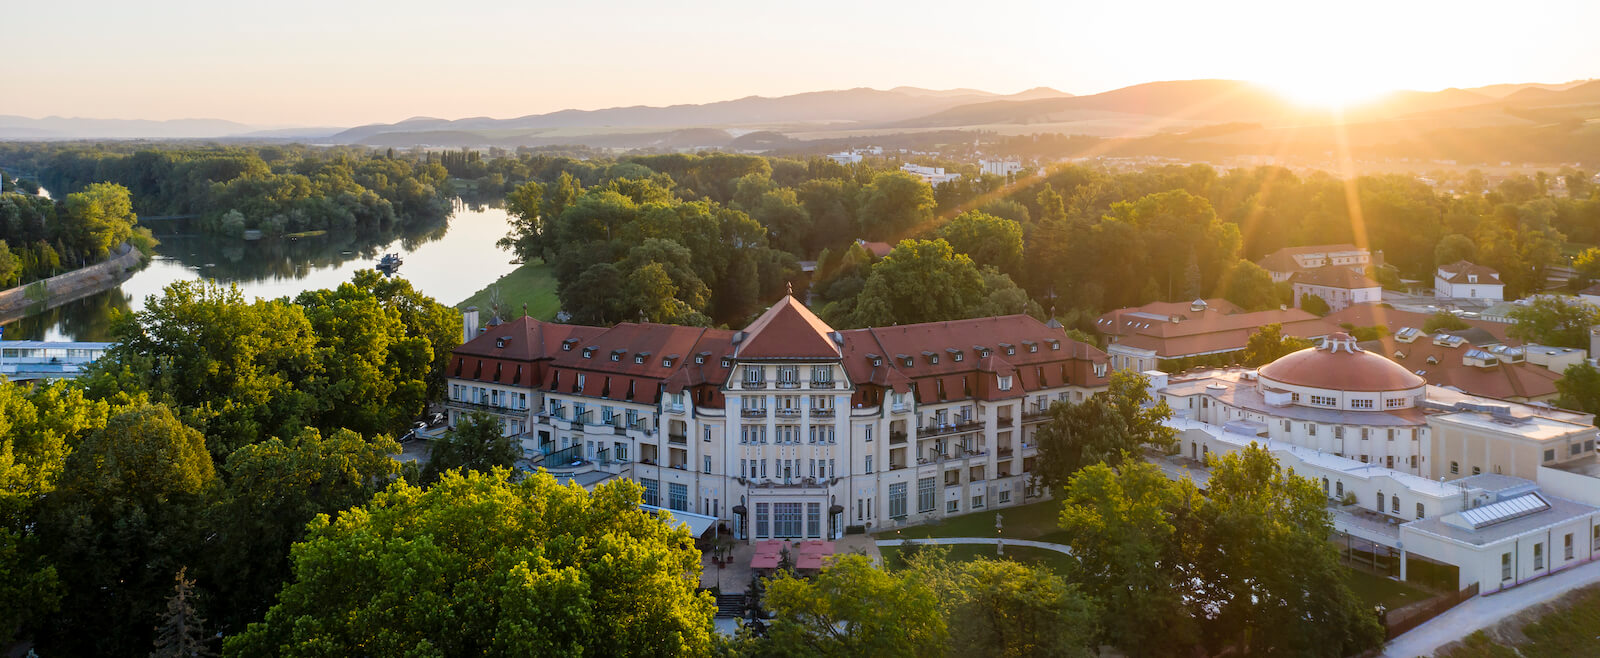 Gezondheidsvakanties naar het luxe 5* resort Thermia Palace Health Spa Resort in het Slowaakse kuuroord Piestany